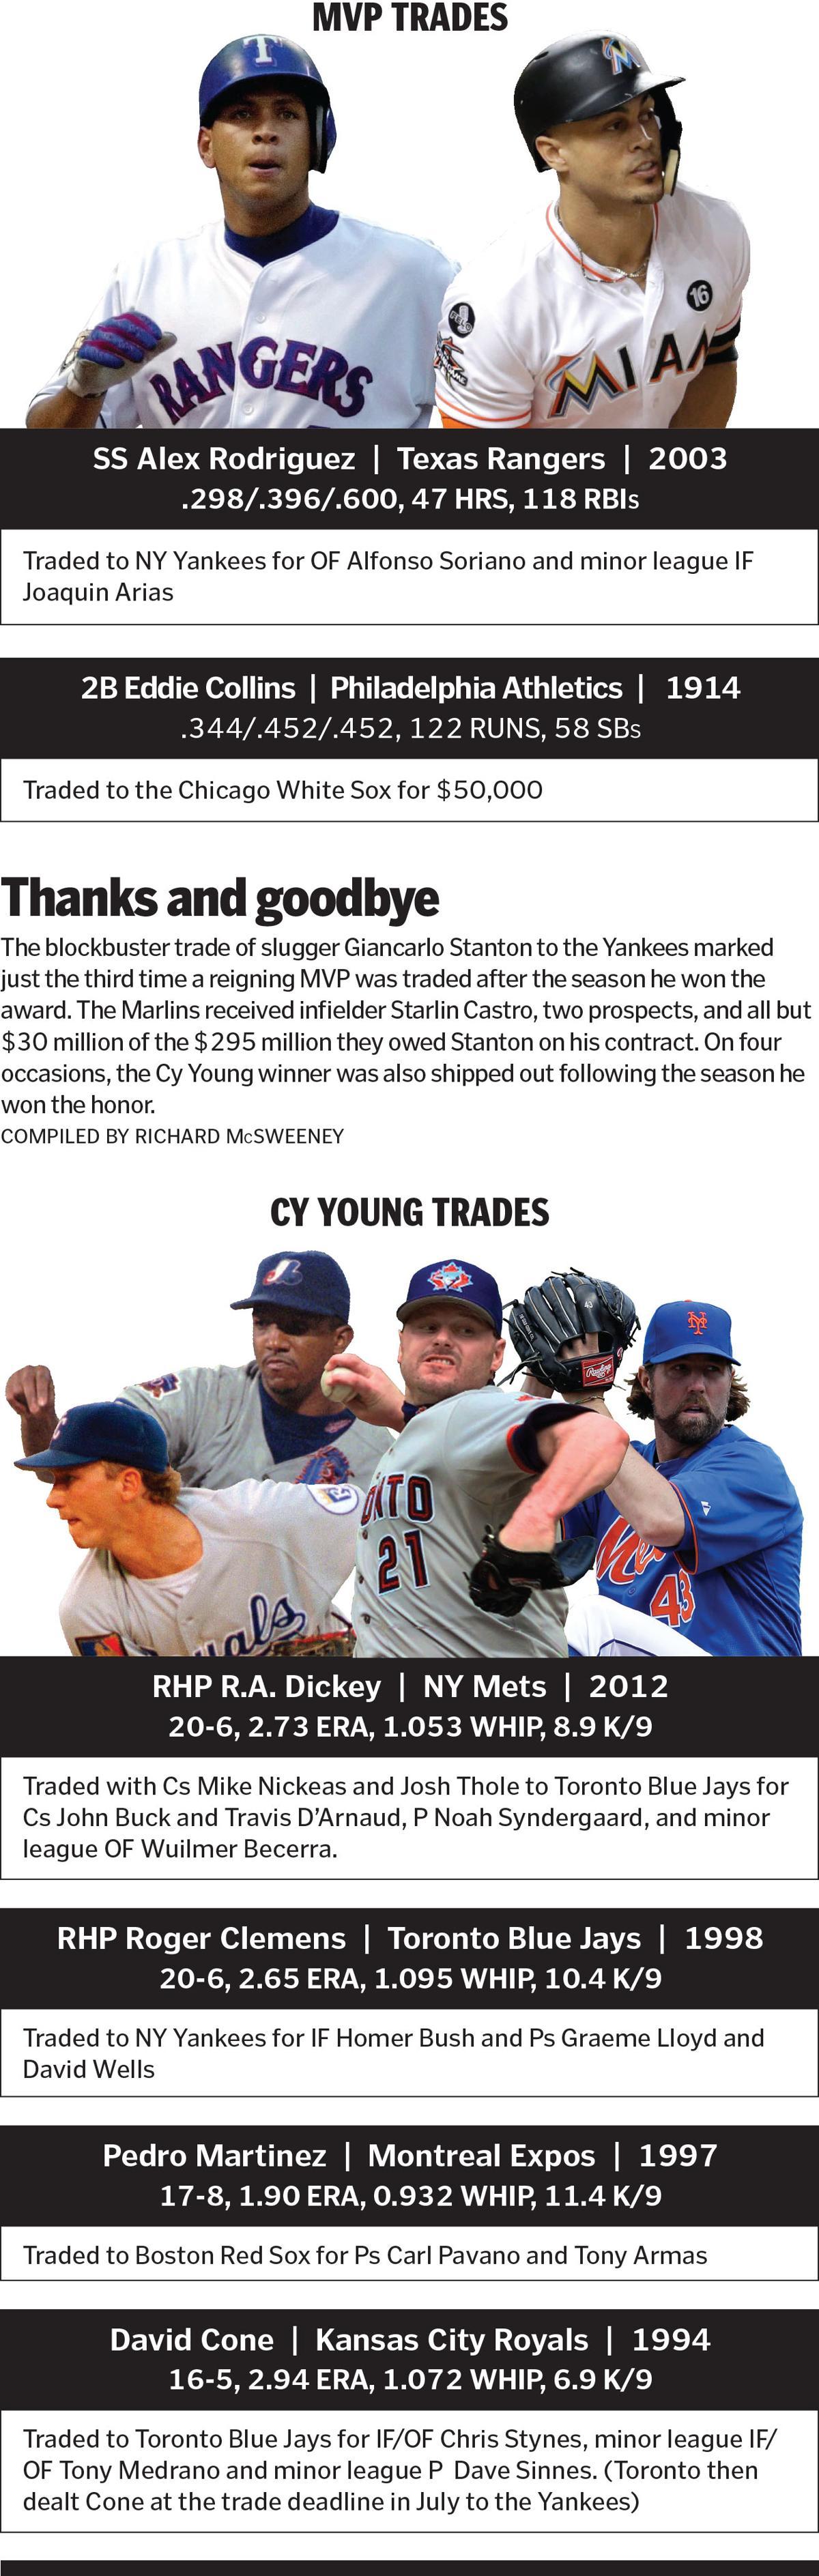 Nick Cafardo: Manny Machado should be the Red Sox' primary